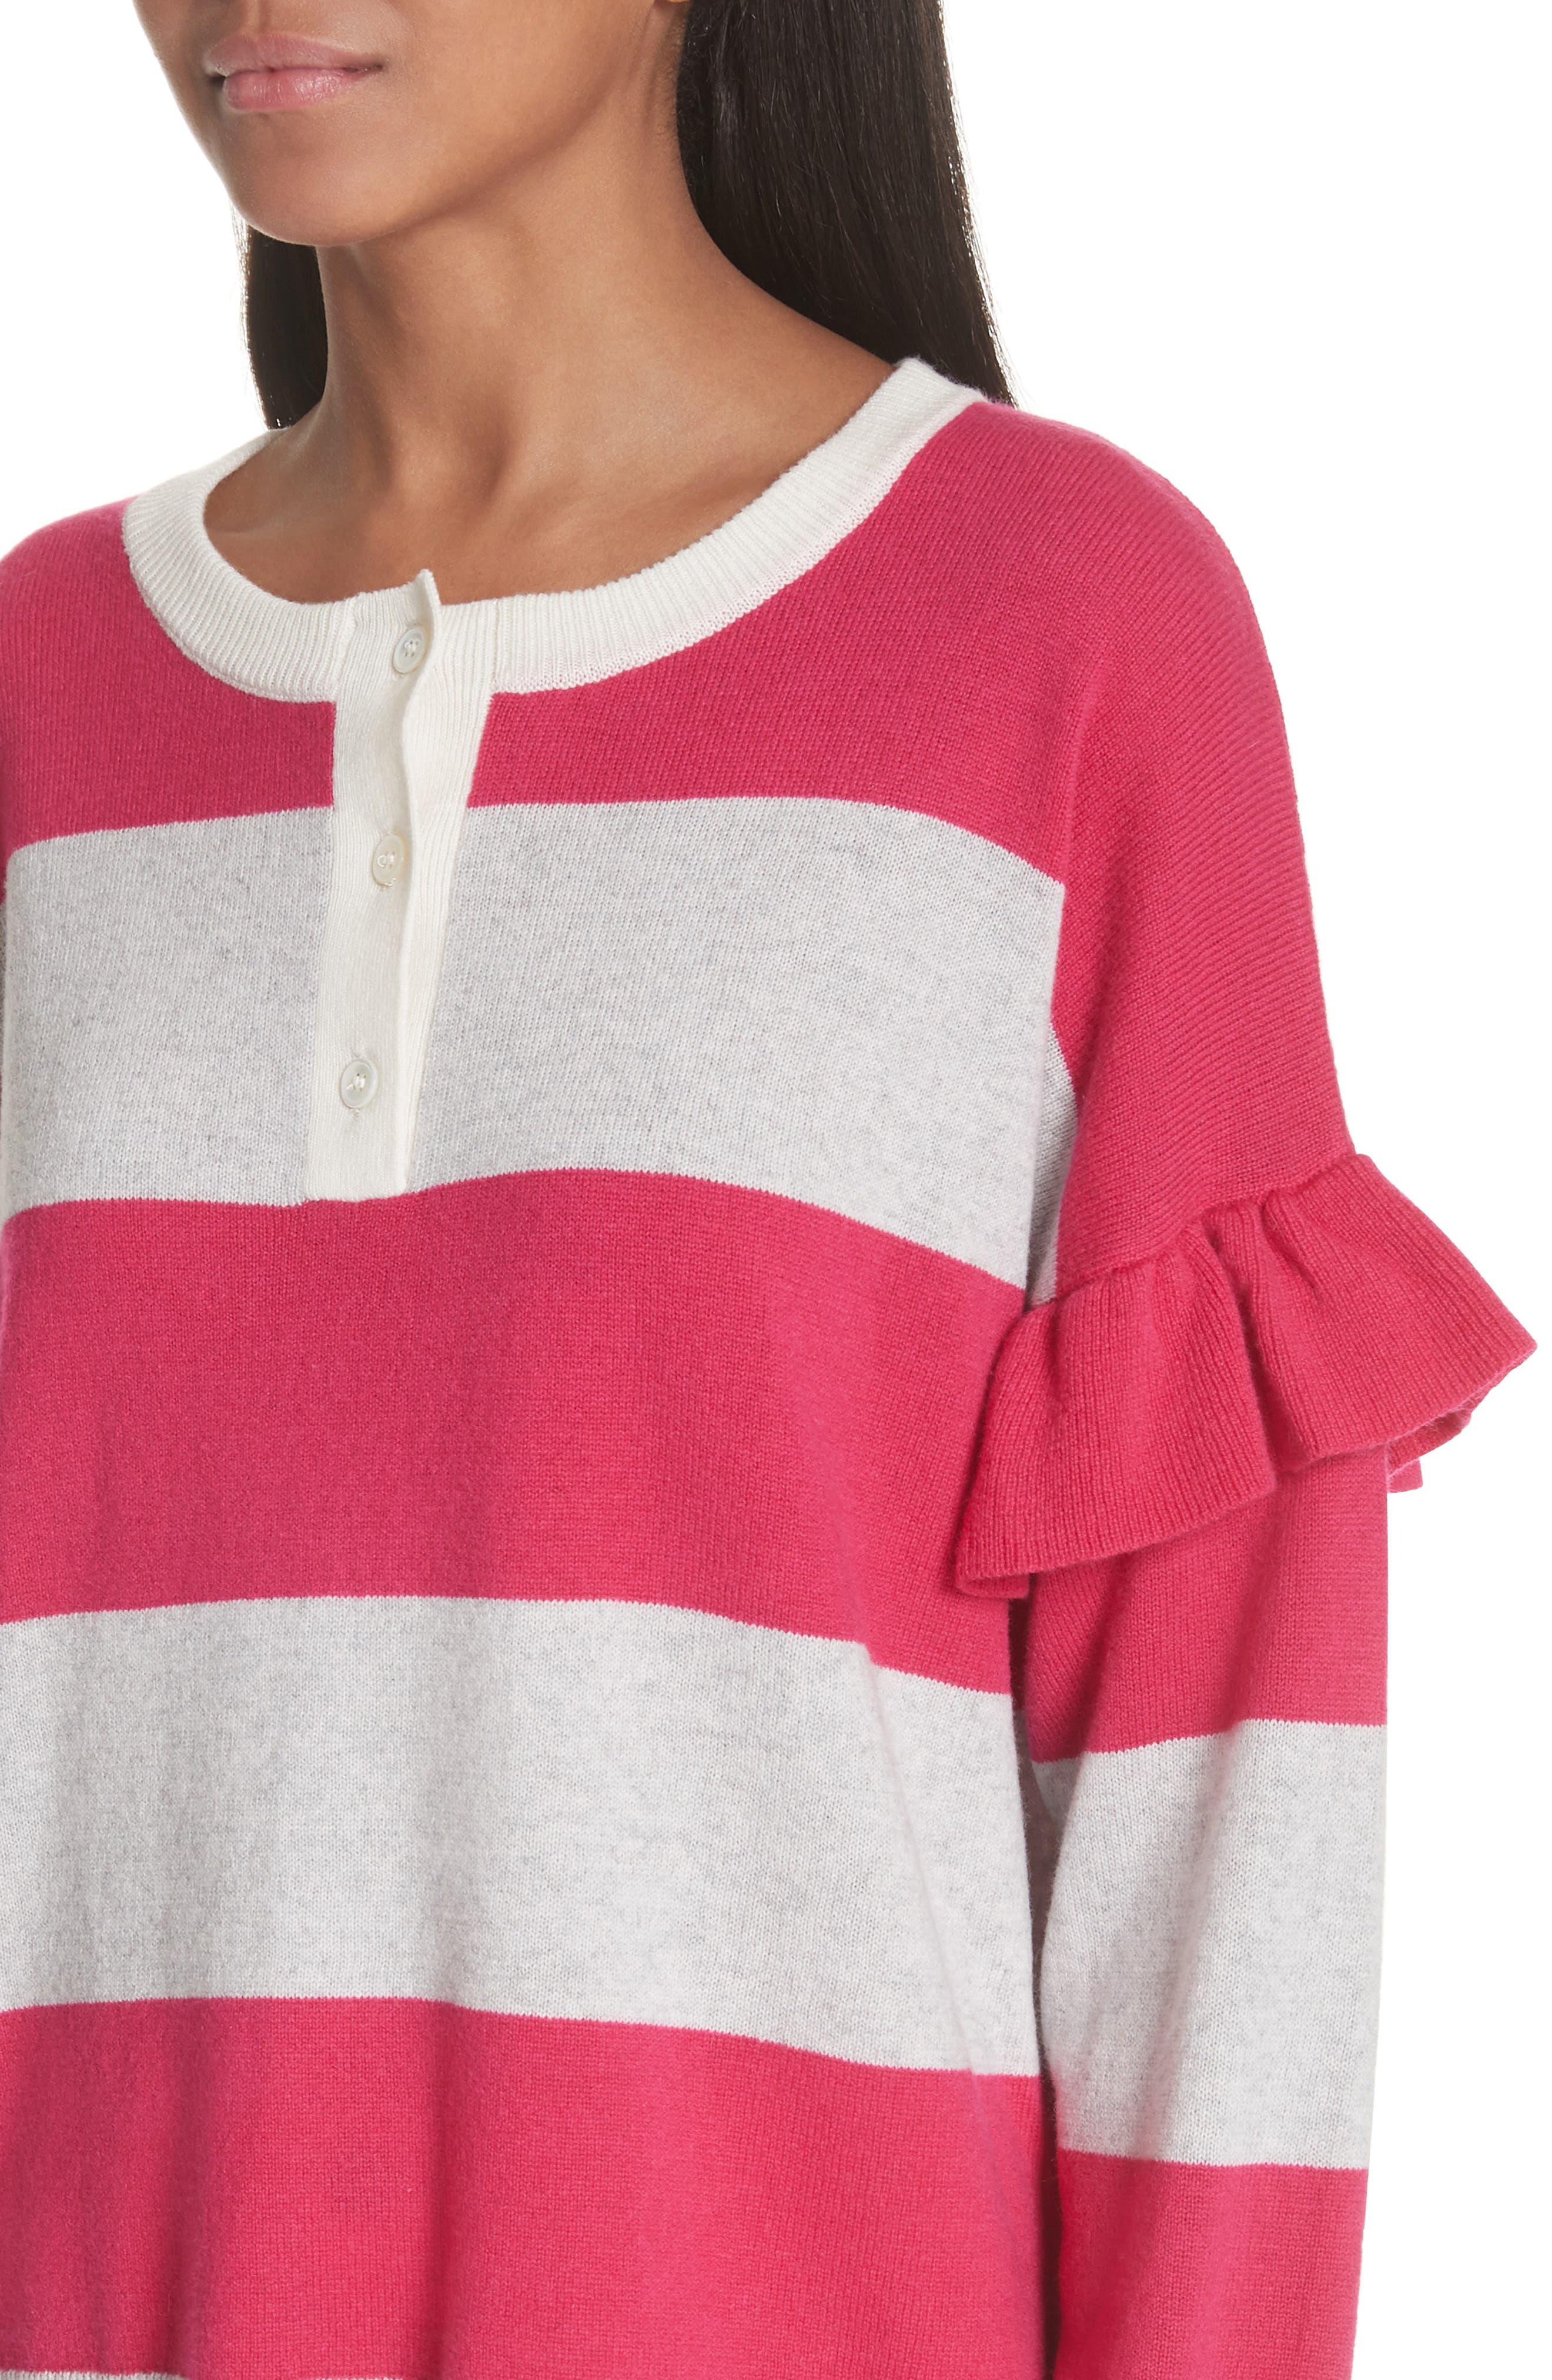 Inghin Stripe Wool & Cashmere Sweater,                             Alternate thumbnail 4, color,                             Hacienda/ Heather Grey